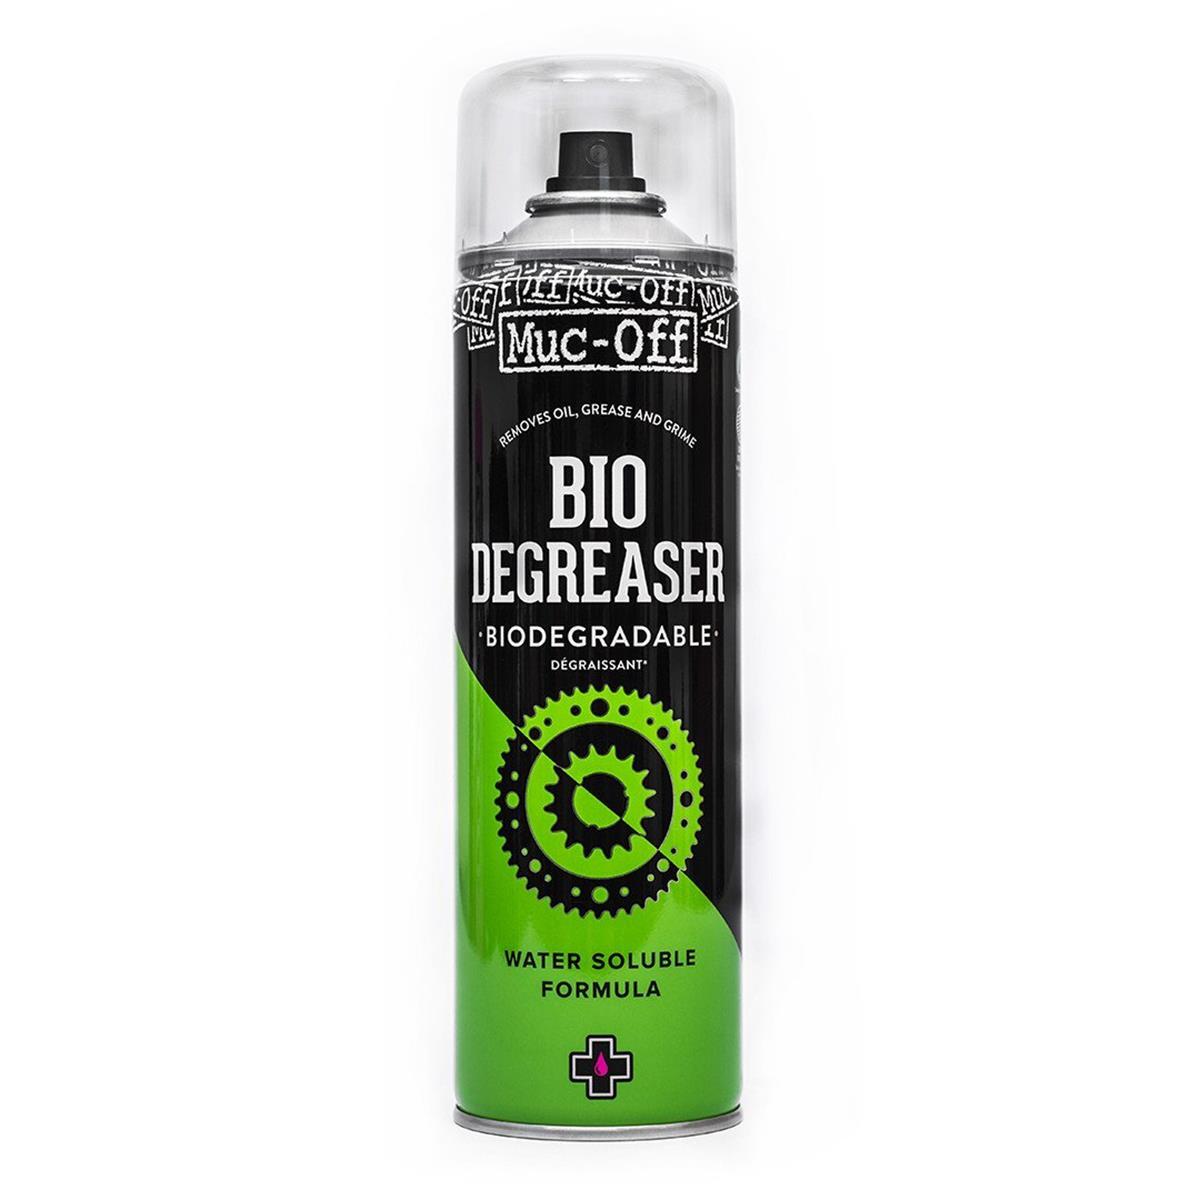 Muc-Off Entfetter Bio Degreaser 500 ml